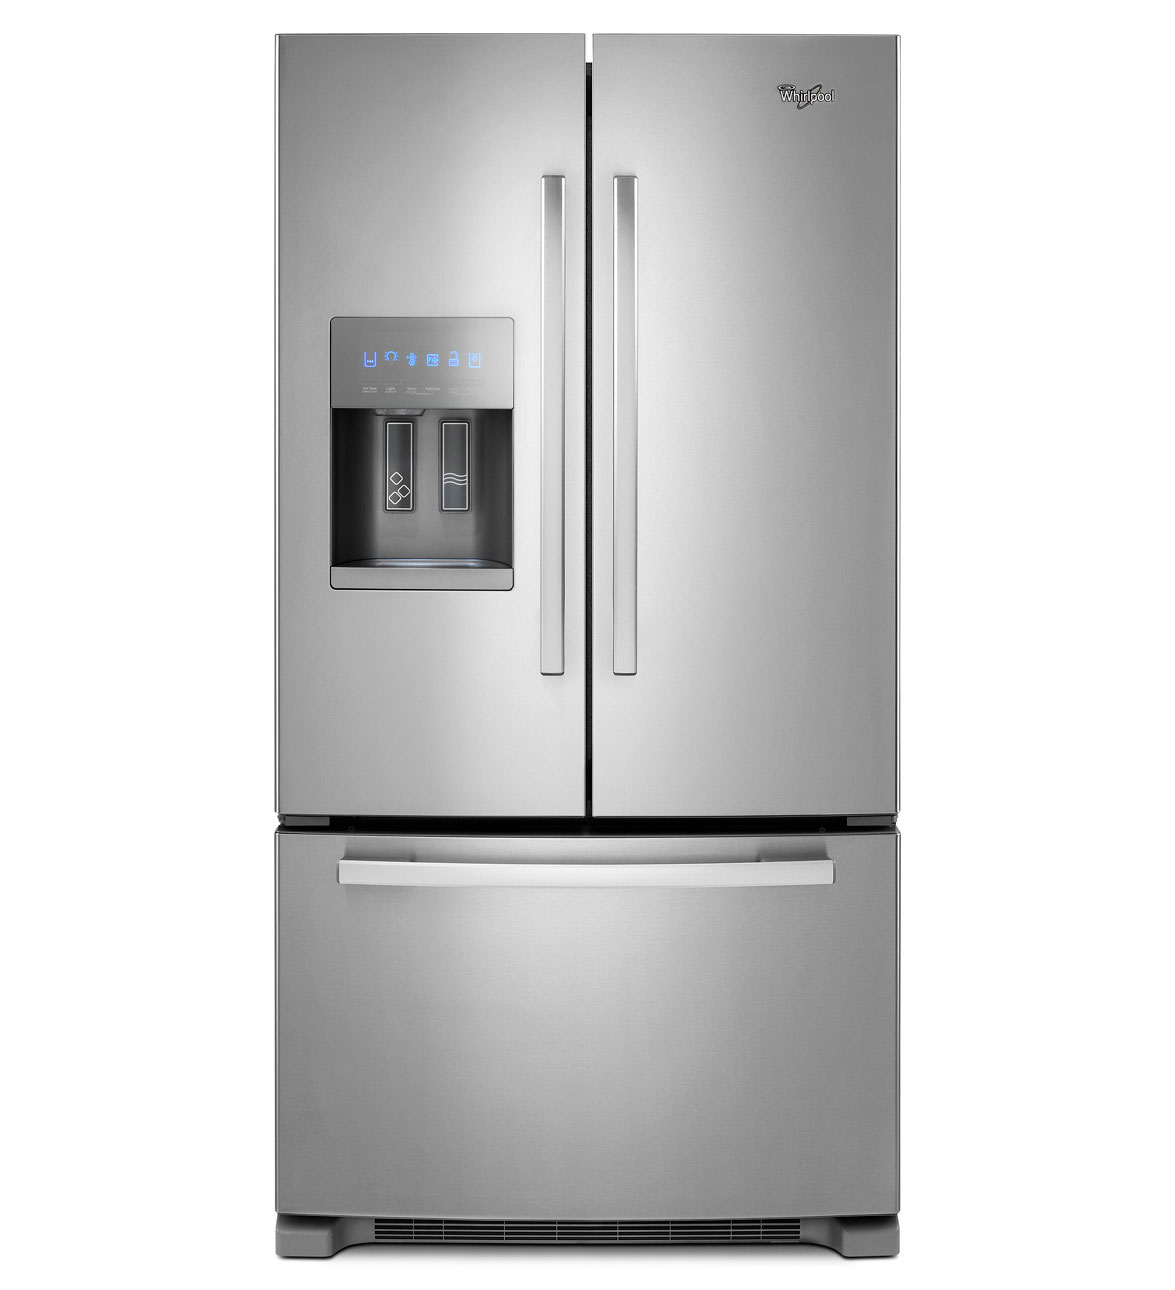 Dmv refrigerator repair company in silver spring maryland - Demontage porte four whirlpool ...